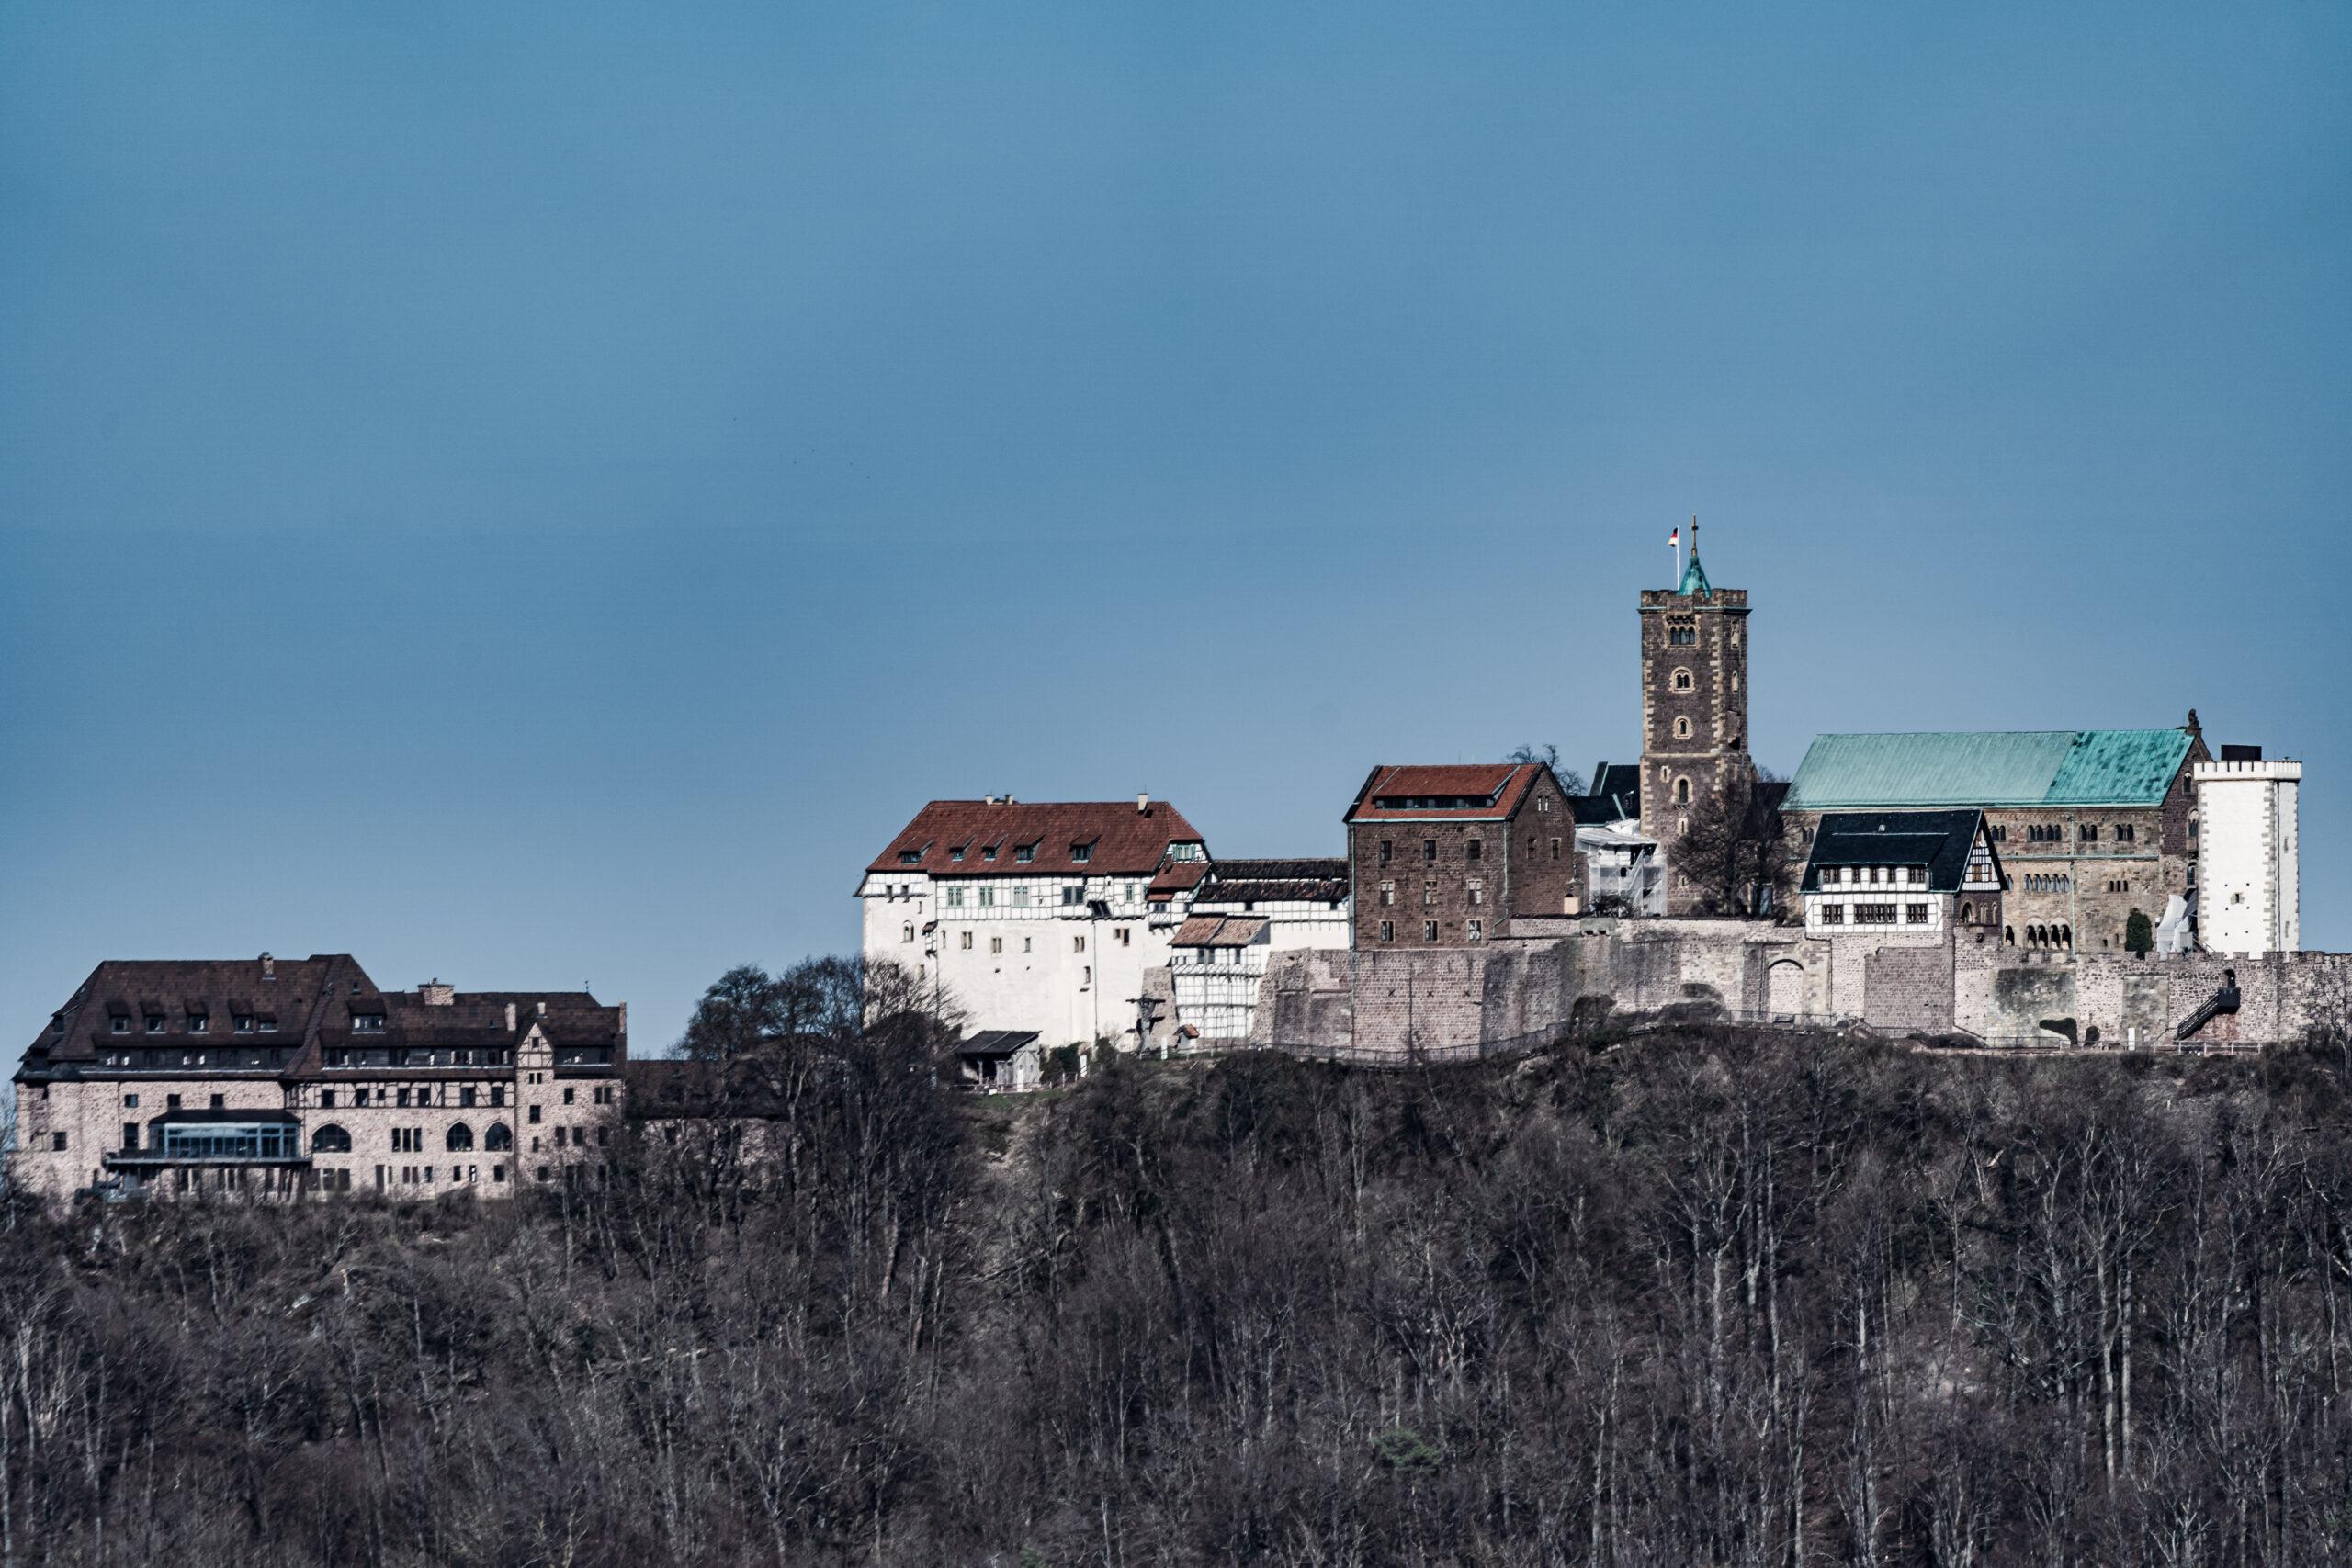 Thüringen, Wartburg